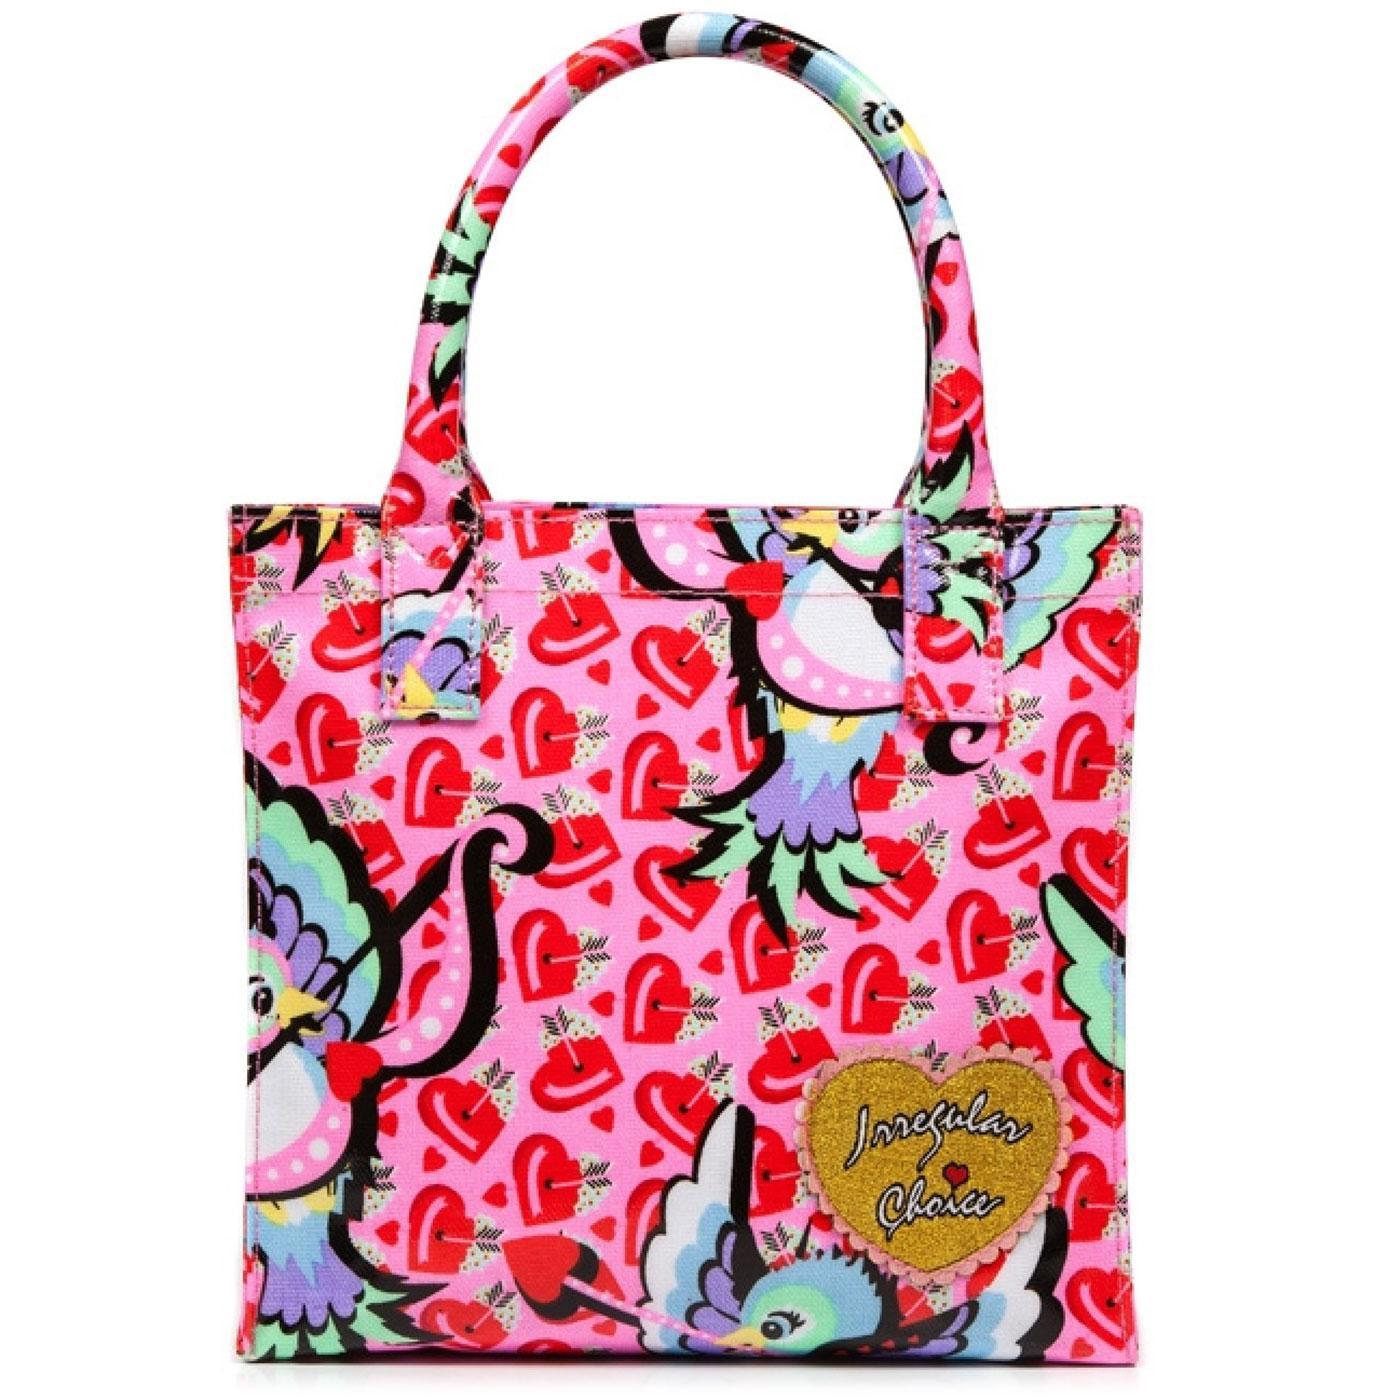 Magic Shopper IRREGULAR CHOICE Small Love Bird Bag